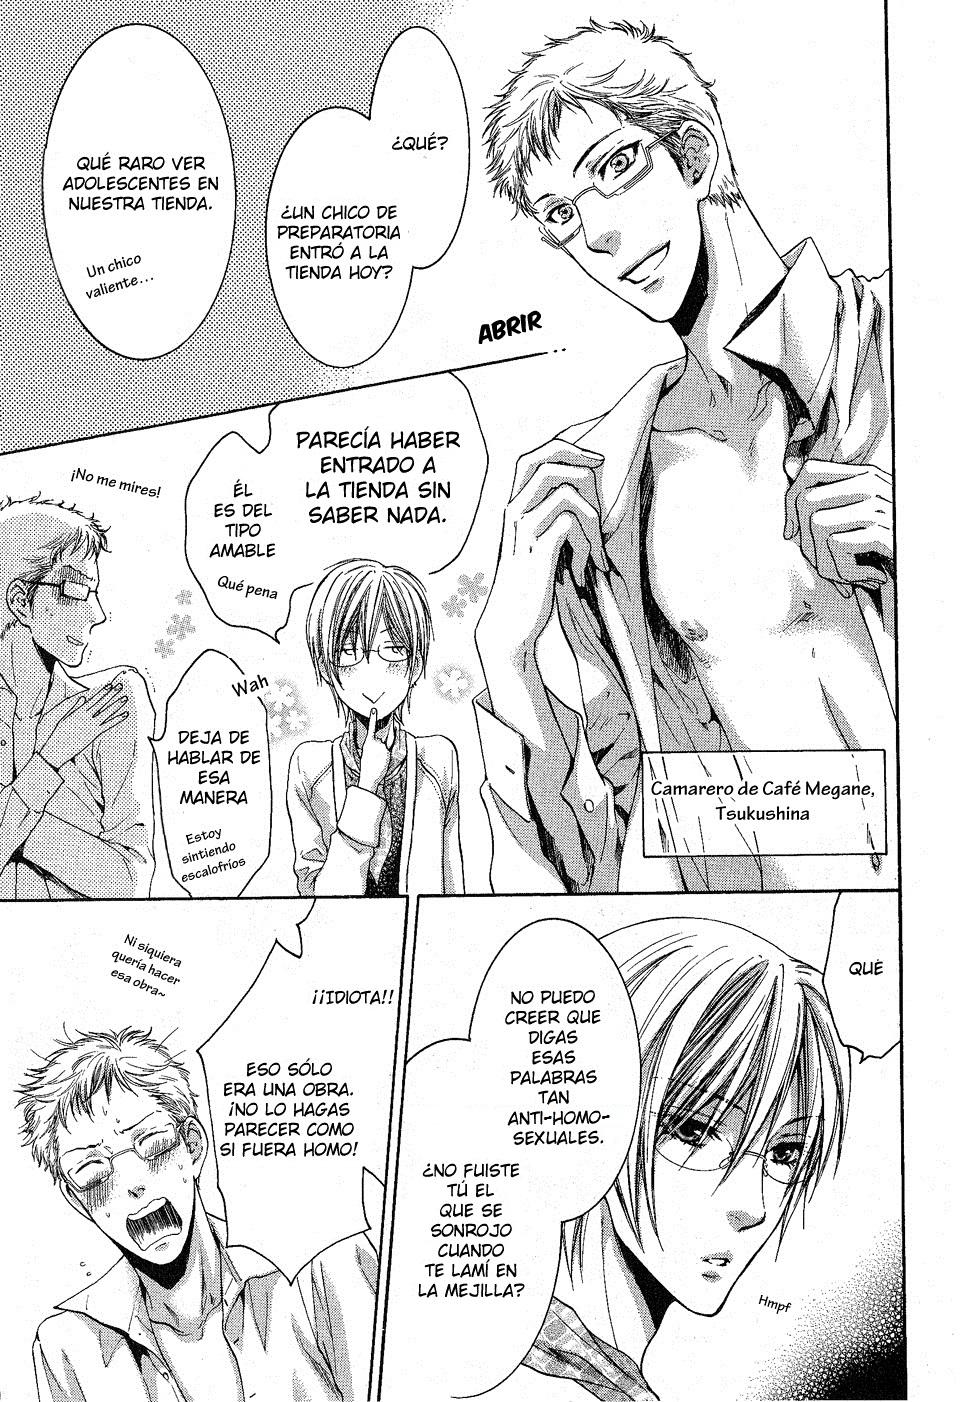 https://c5.ninemanga.com/es_manga/6/15814/378262/676c0c9be43fd984c92b0ecfdab3c0d9.jpg Page 22